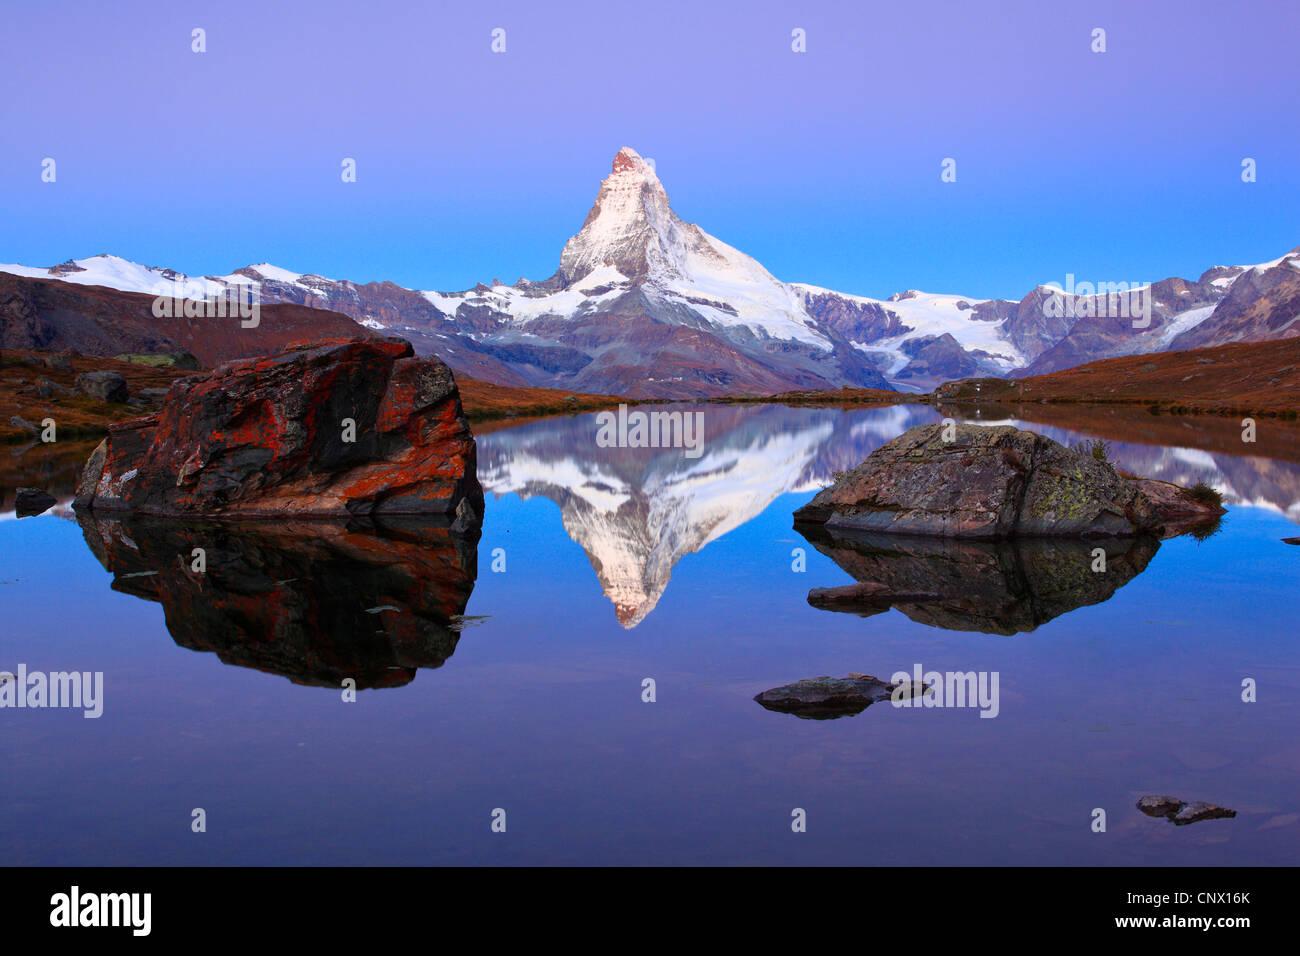 view at the Matterhorn from a mountain lake, Switzerland, Valais Stock Photo